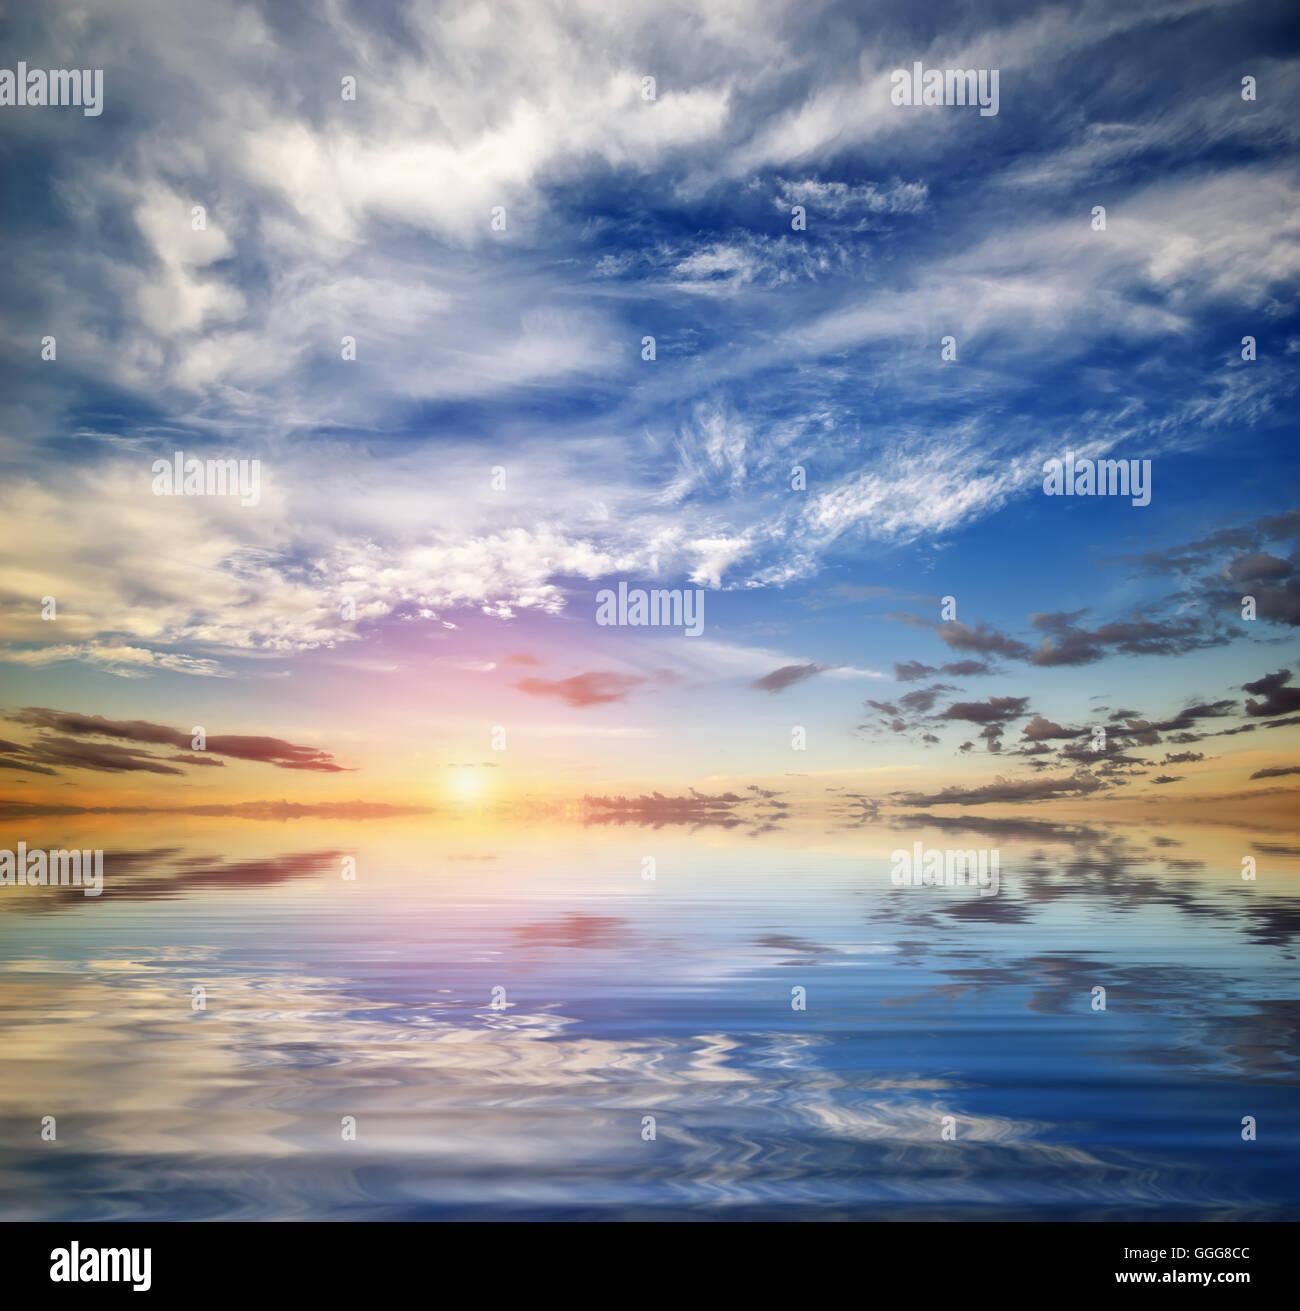 Beau paysage marin. Ciel bleu profond en journée ensoleillée. Fond de Ciel. Photo Stock